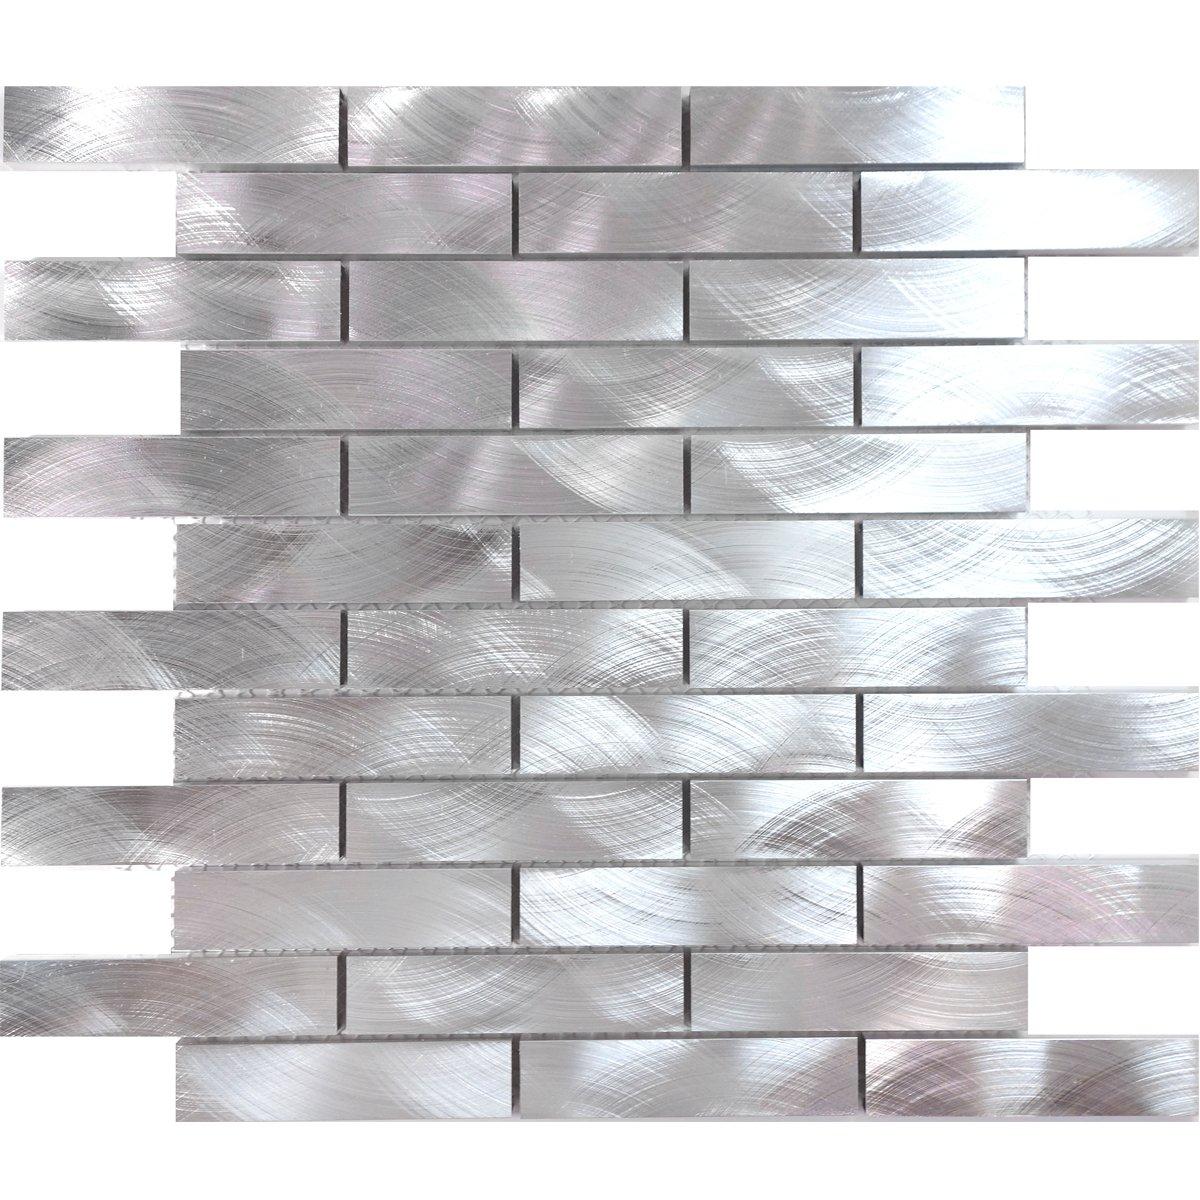 Modket TDH211MO Metal Metallic Aluminium Brick Joint Pattern Mosaic Tile Backsplash